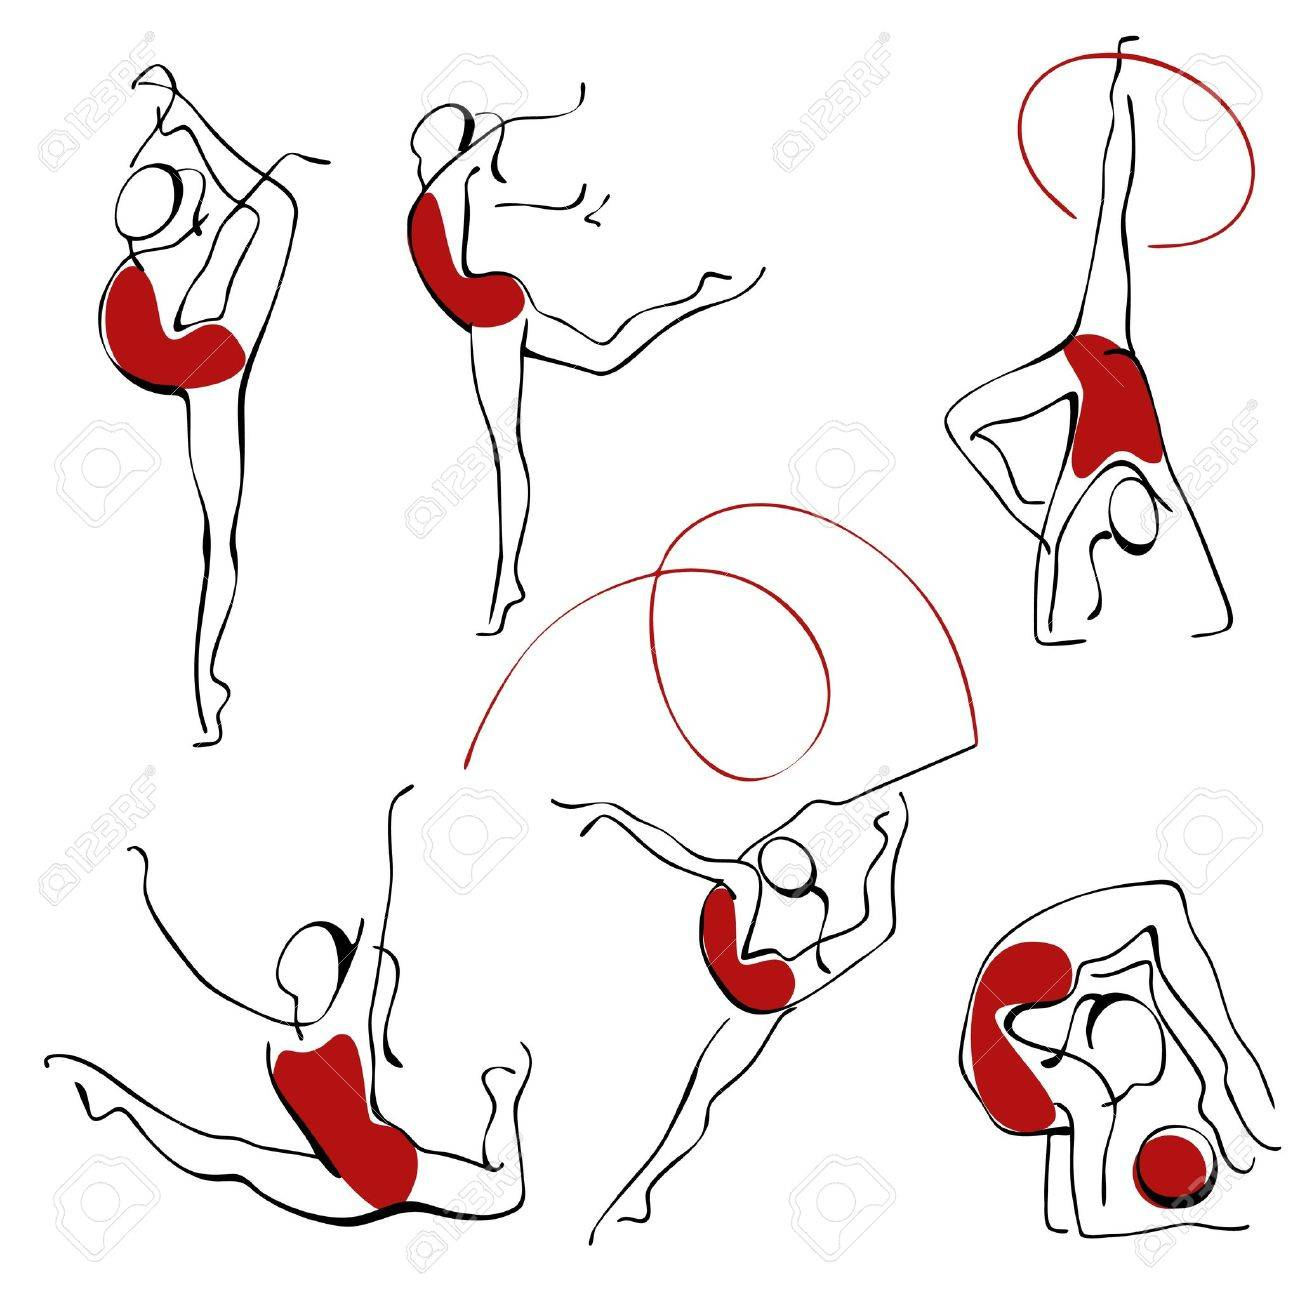 rhythmic gymnastics. set gray figures 3. Stock Vector - 9387115